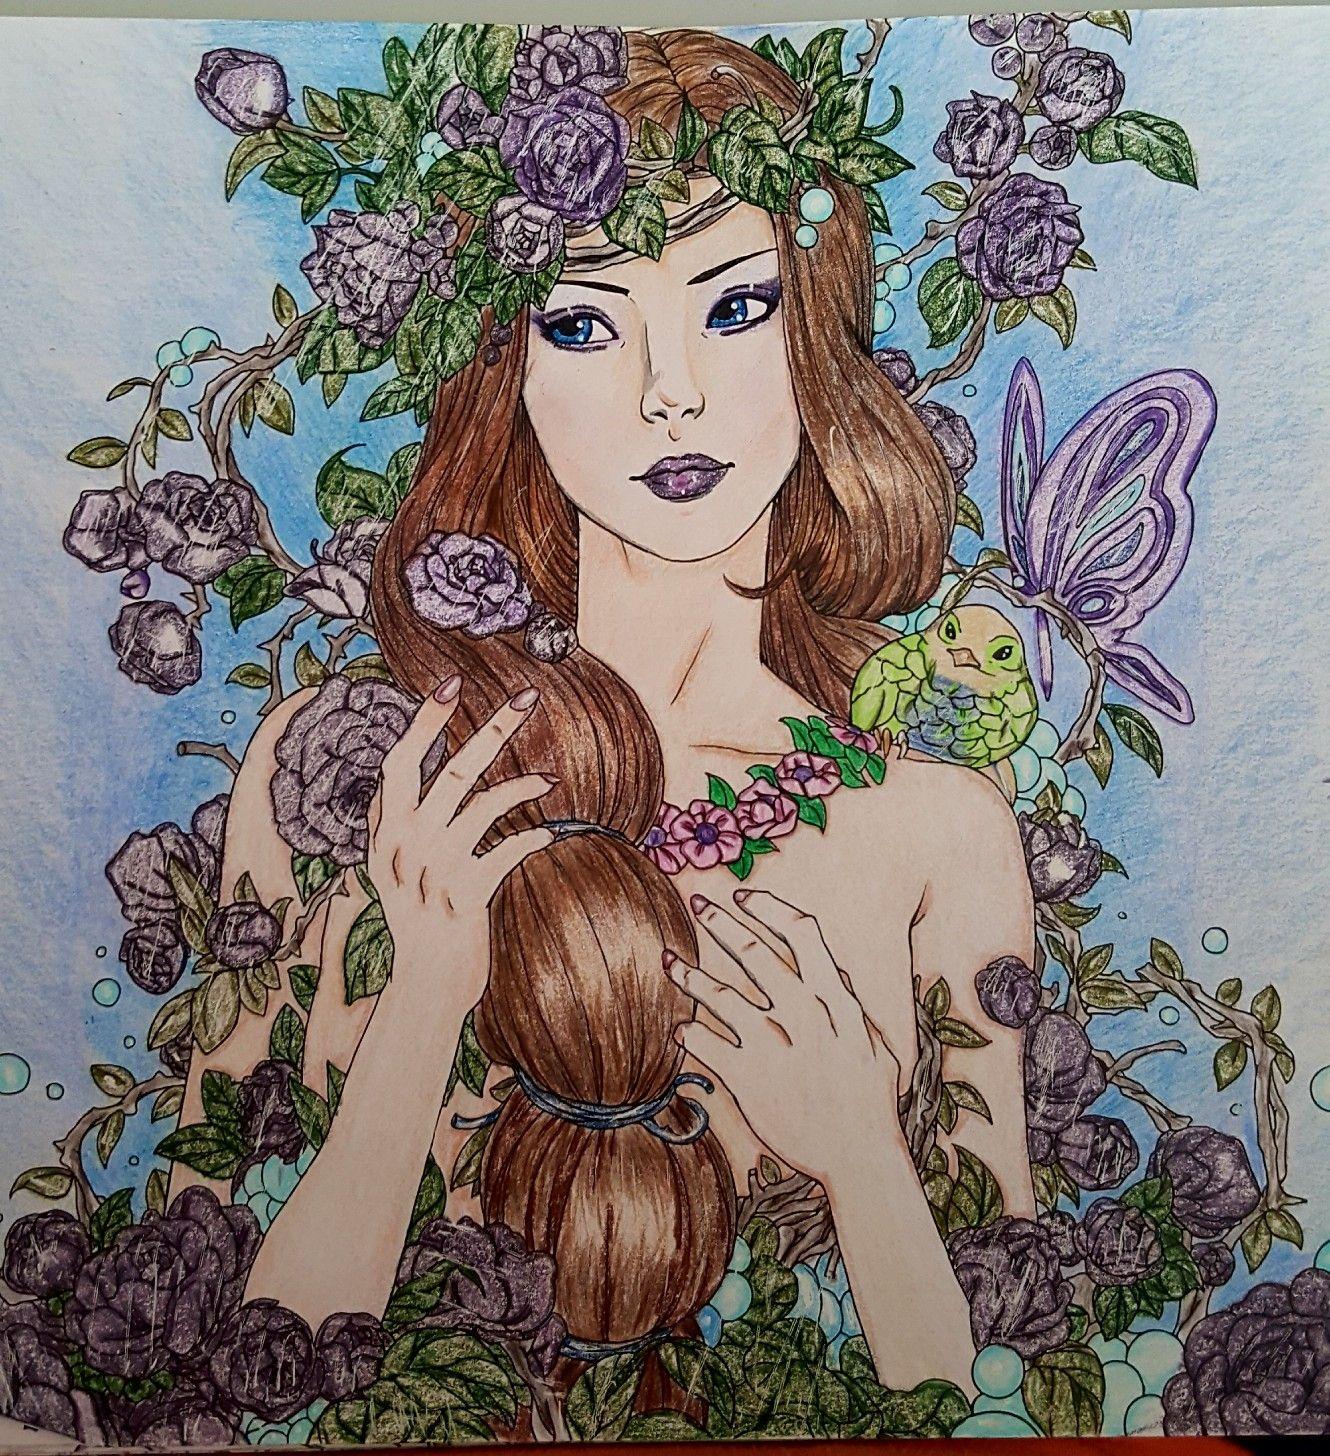 Fantasia Coloring Book Kim Rinehart Colorist